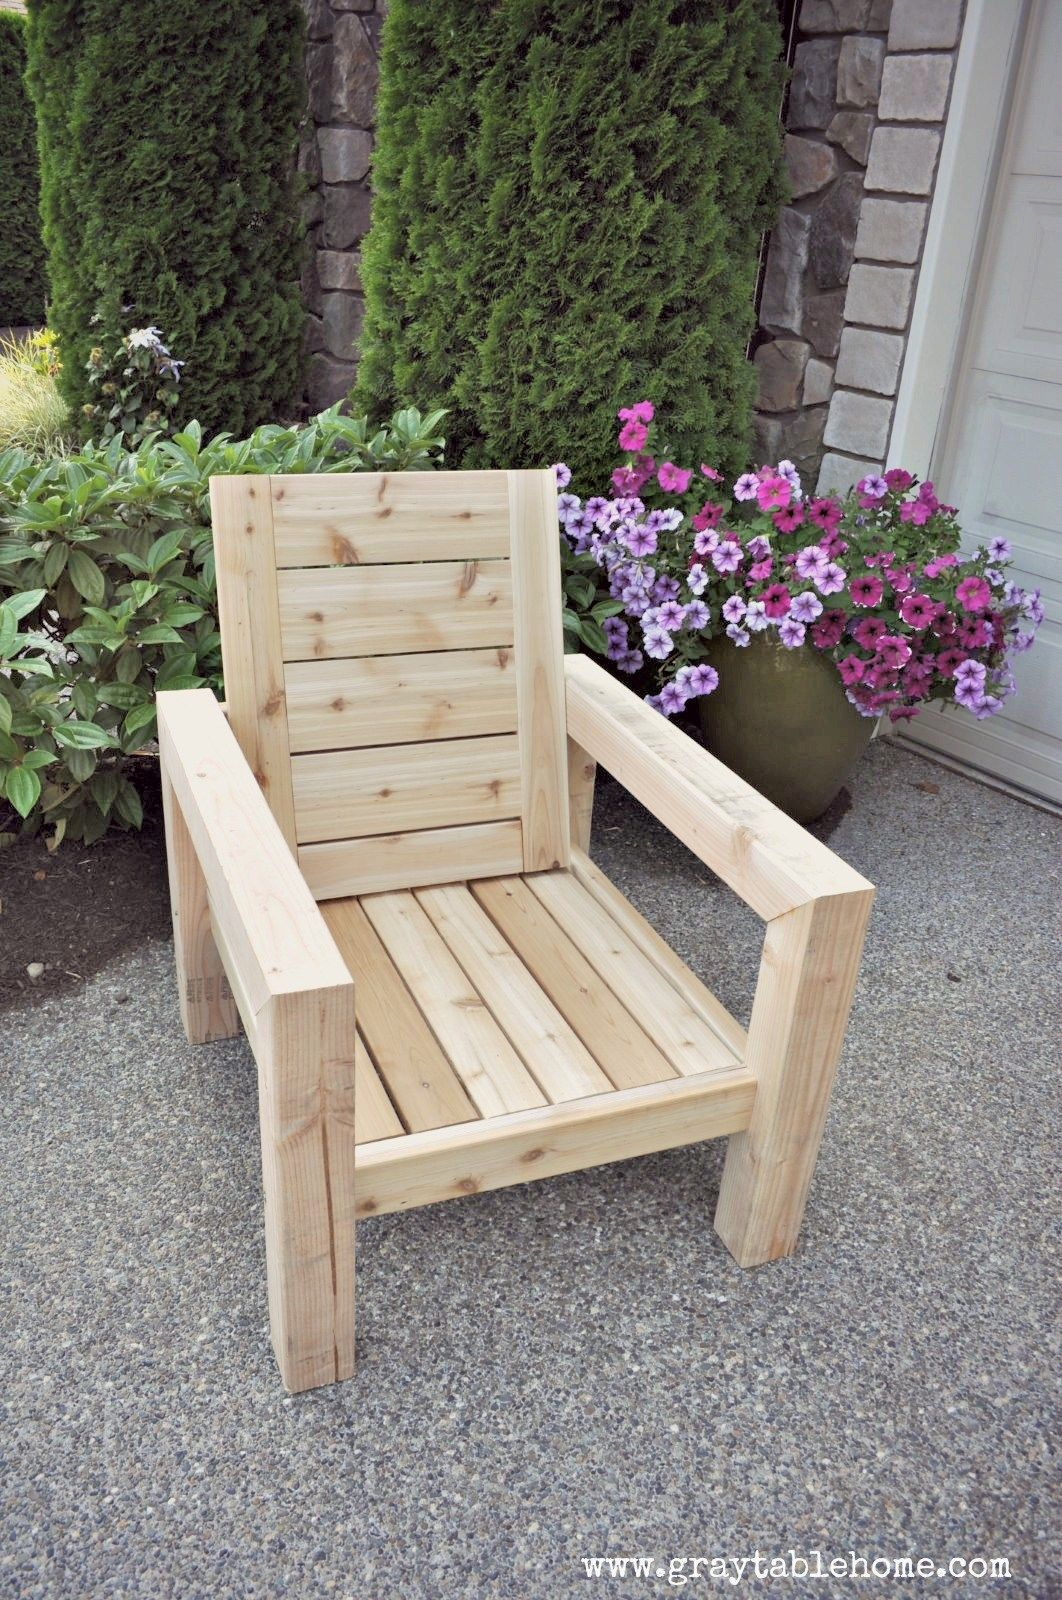 DIY Modern Rustic Outdoor Chair plans using outdoor